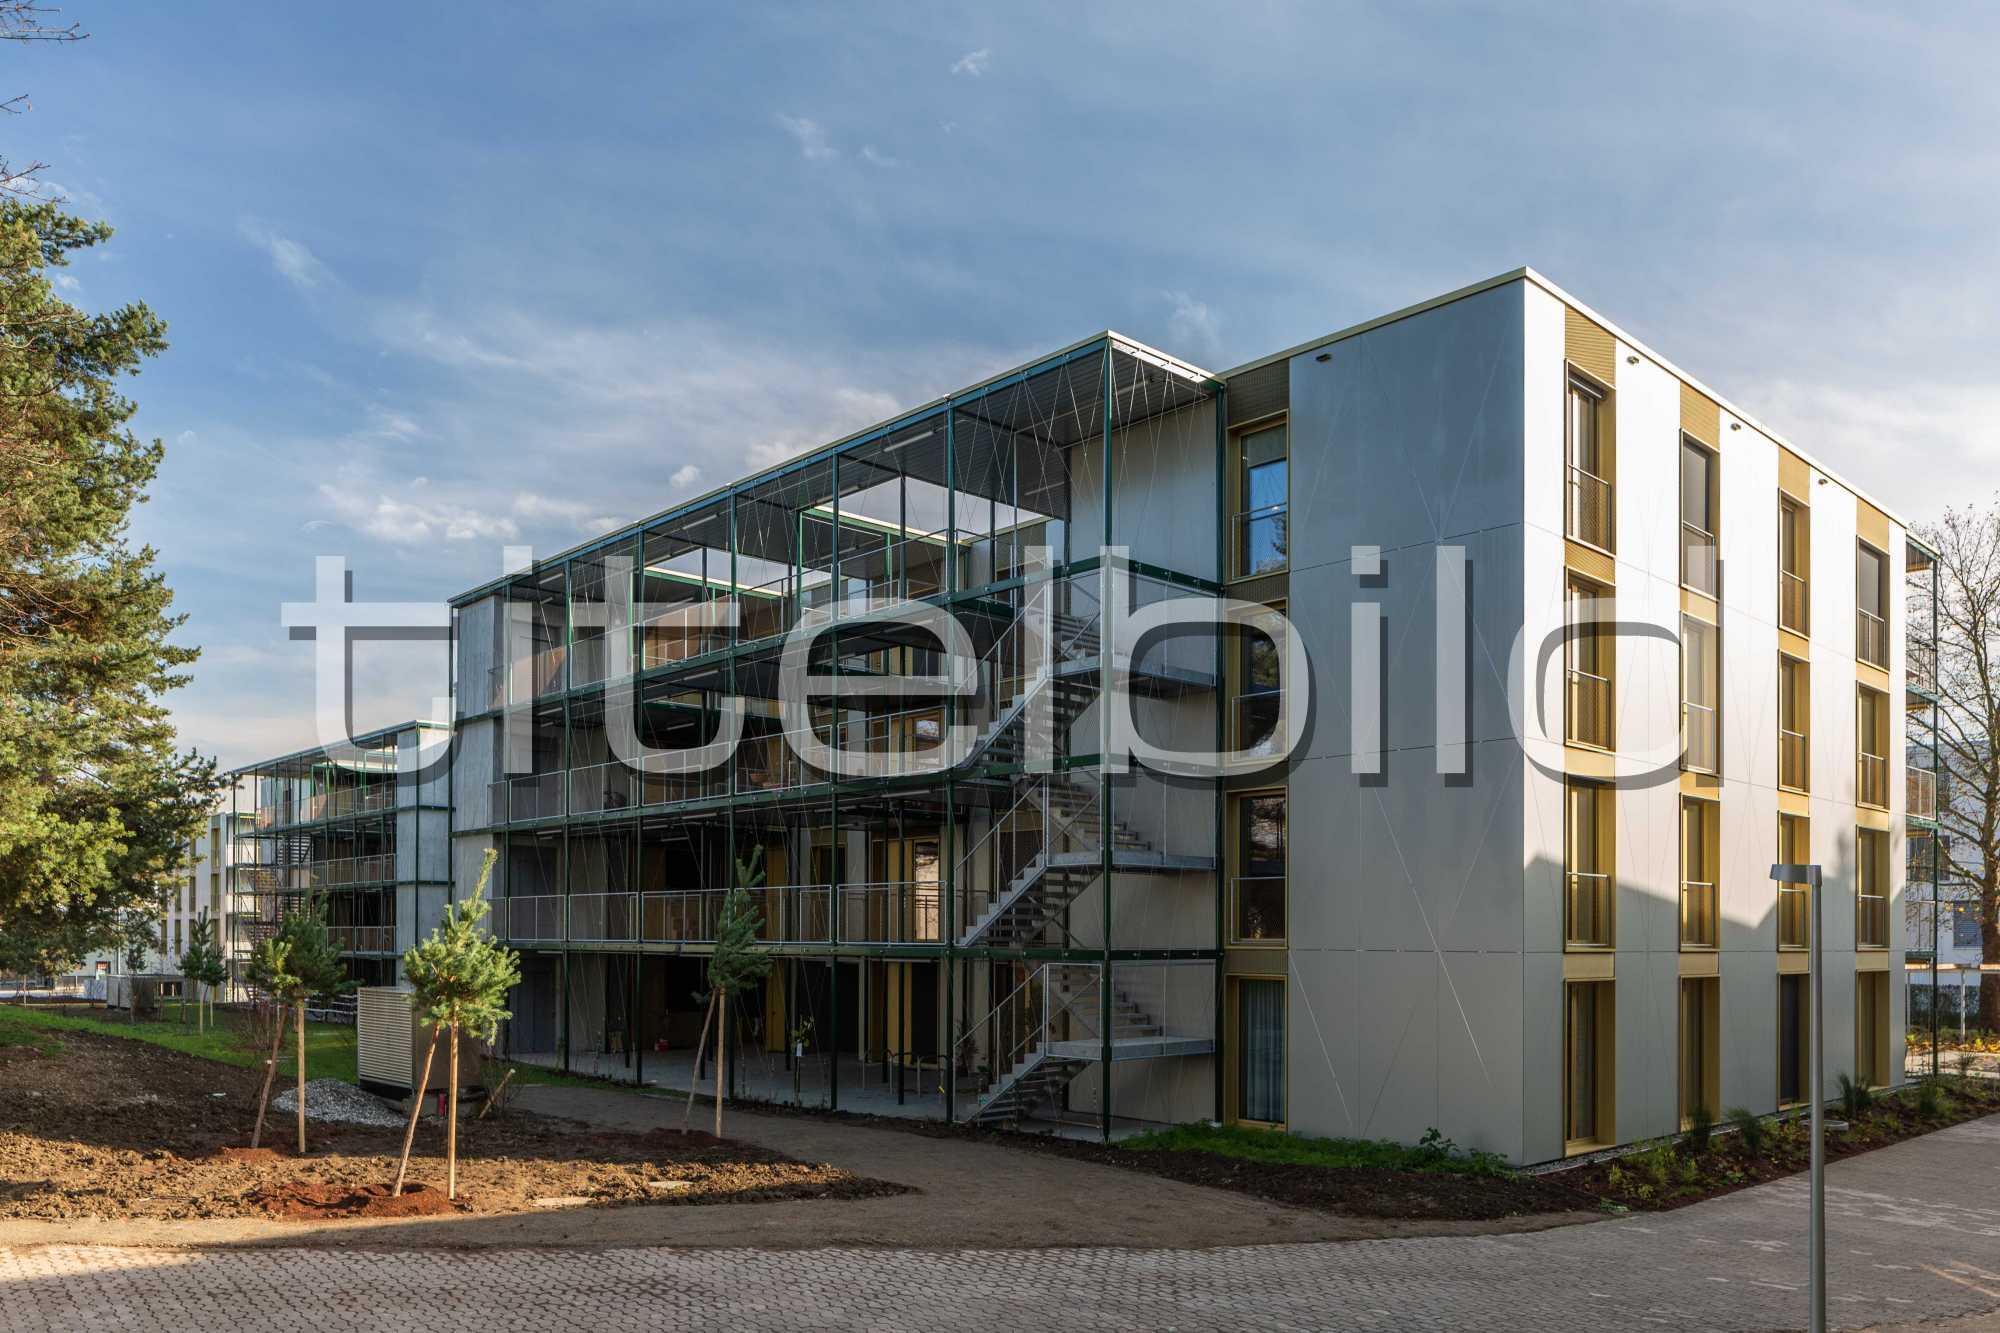 Projektbild-Nr. 4: Quattro Sorelle, Bülach